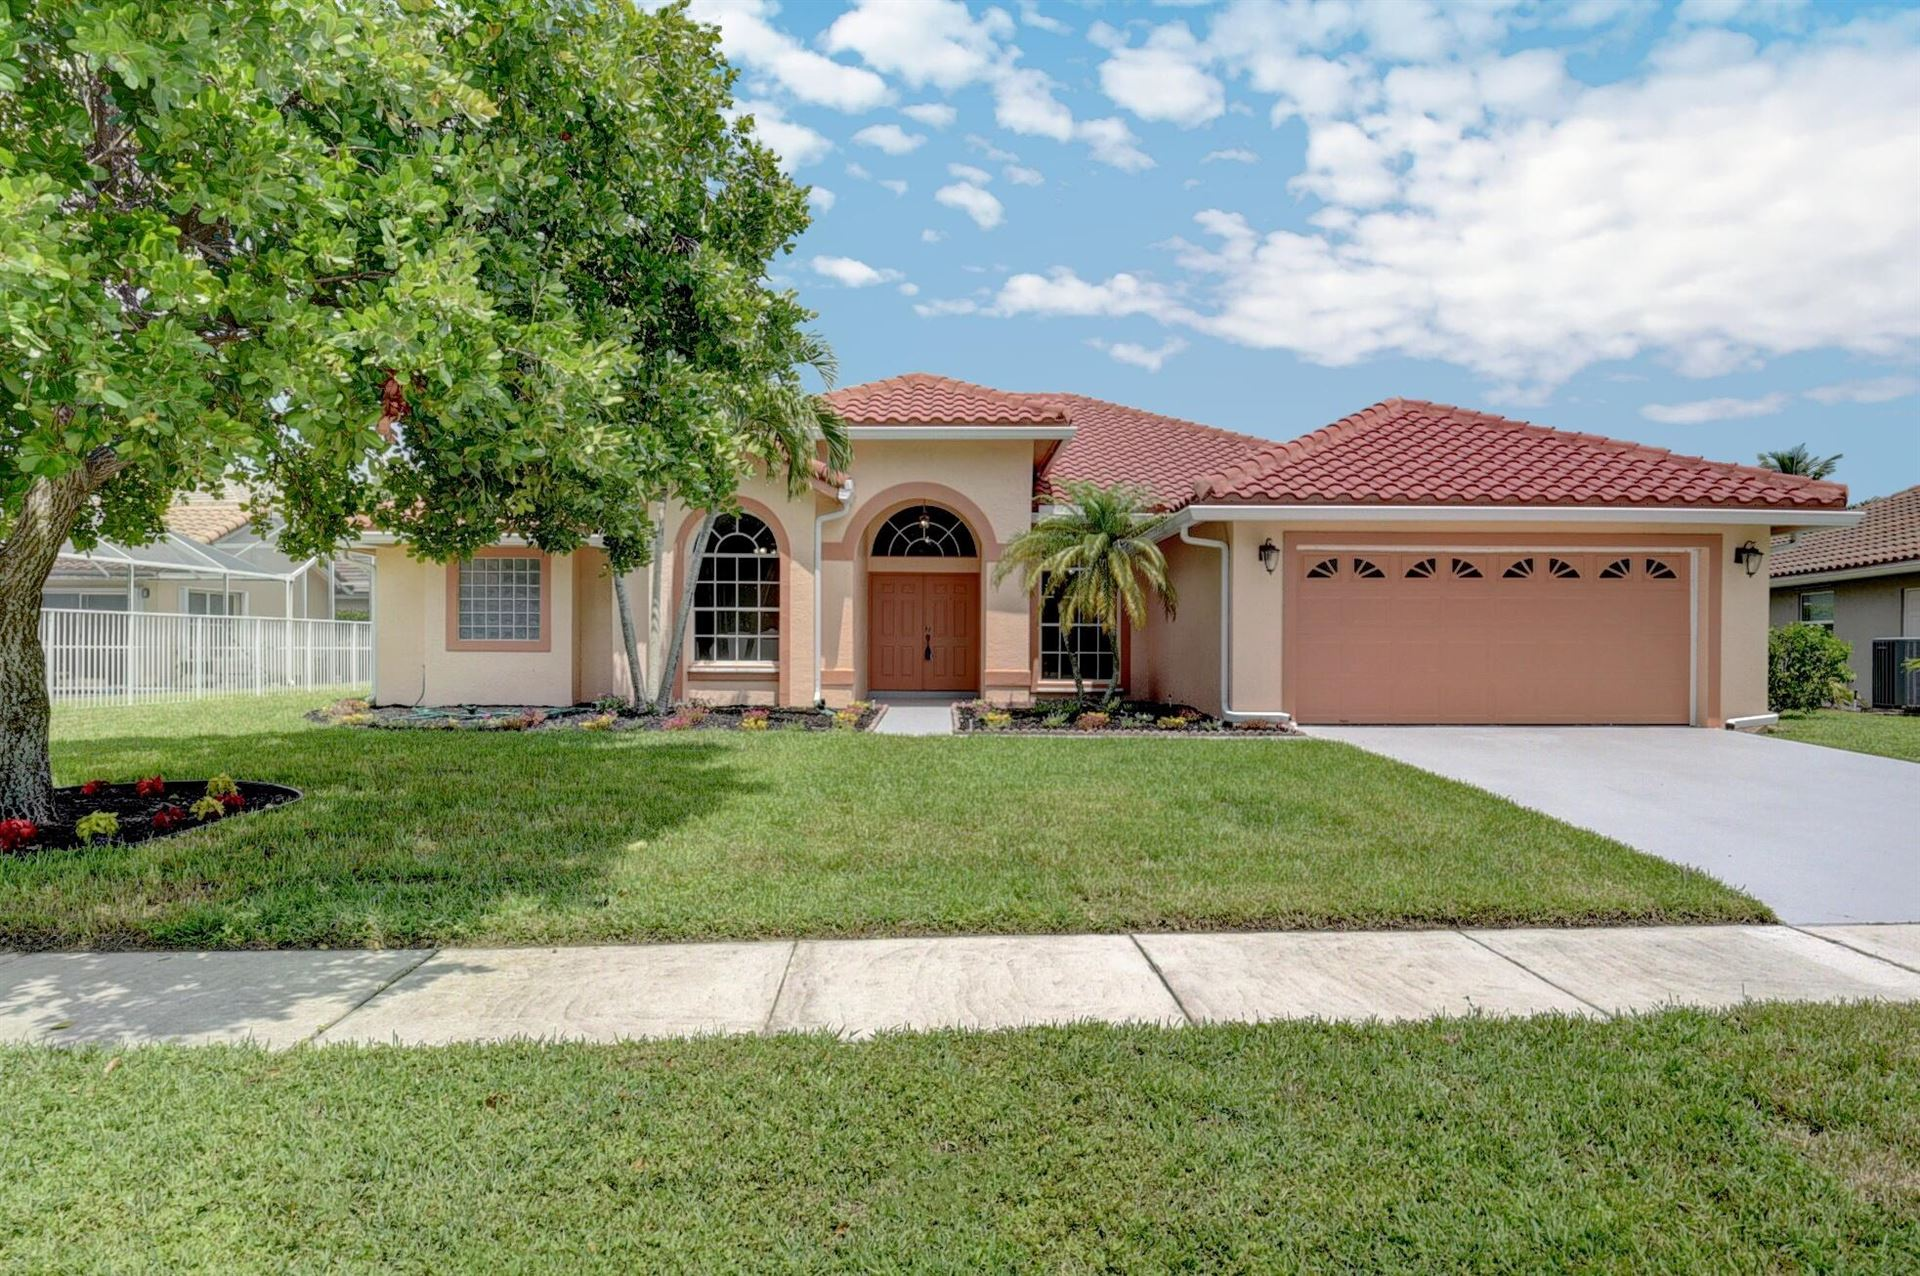 7879 Forestay Drive, Lake Worth, FL 33467 - MLS#: RX-10731696